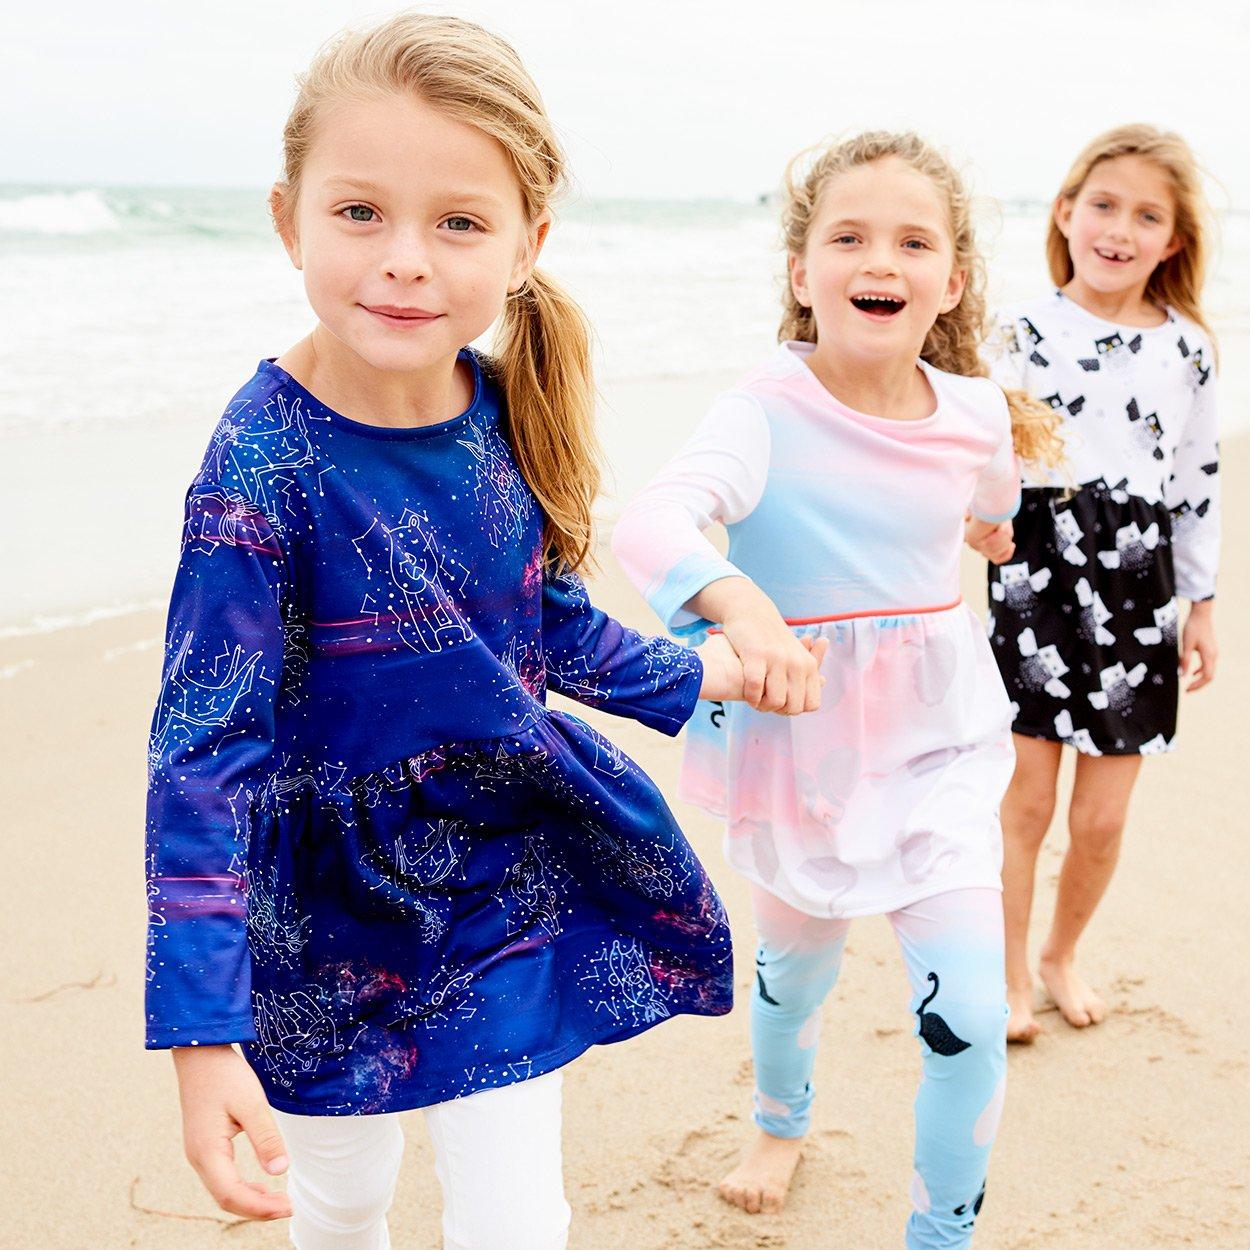 Constellations Dress Girls Size 2 12 Purple Moisture Wicking Cosmos Three Girls Walking On The Beach Sunpoplife